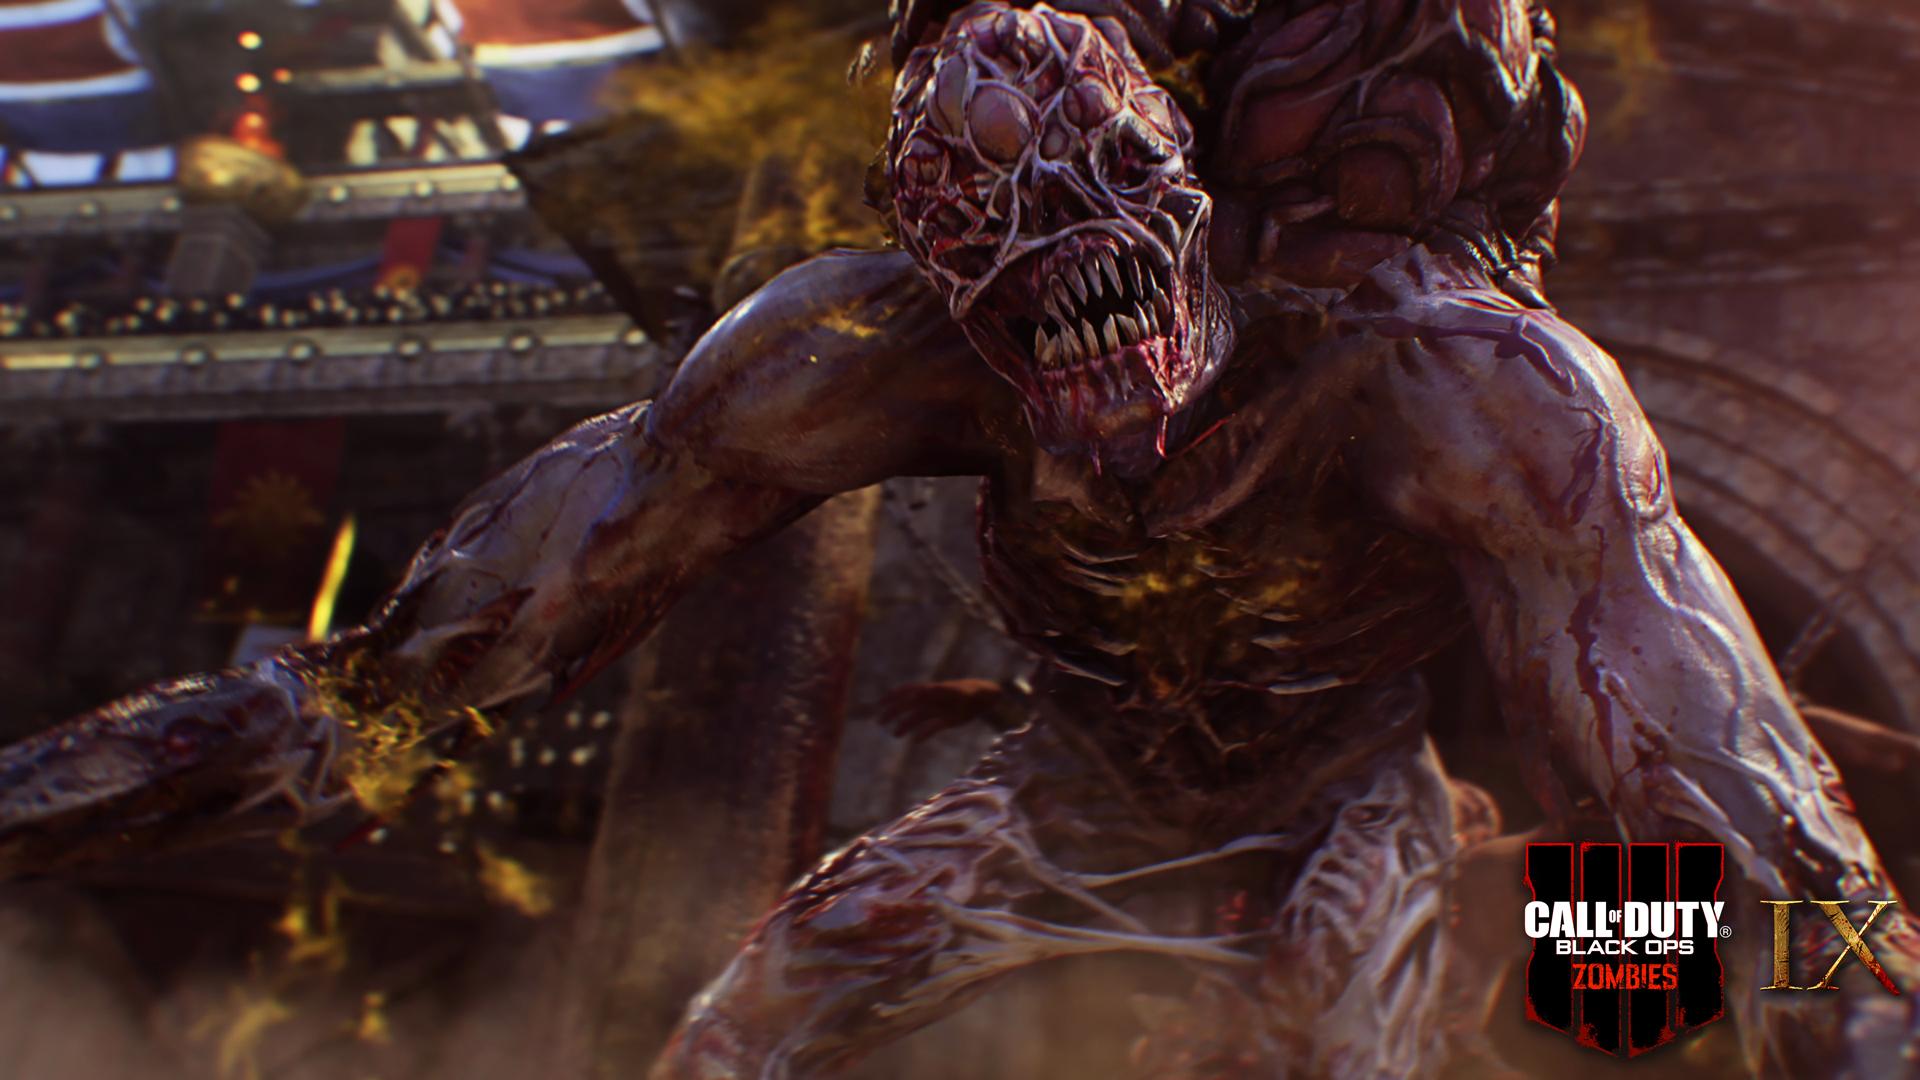 Call of Duty Black Ops 4 Screenshot #1. Bild: Activision